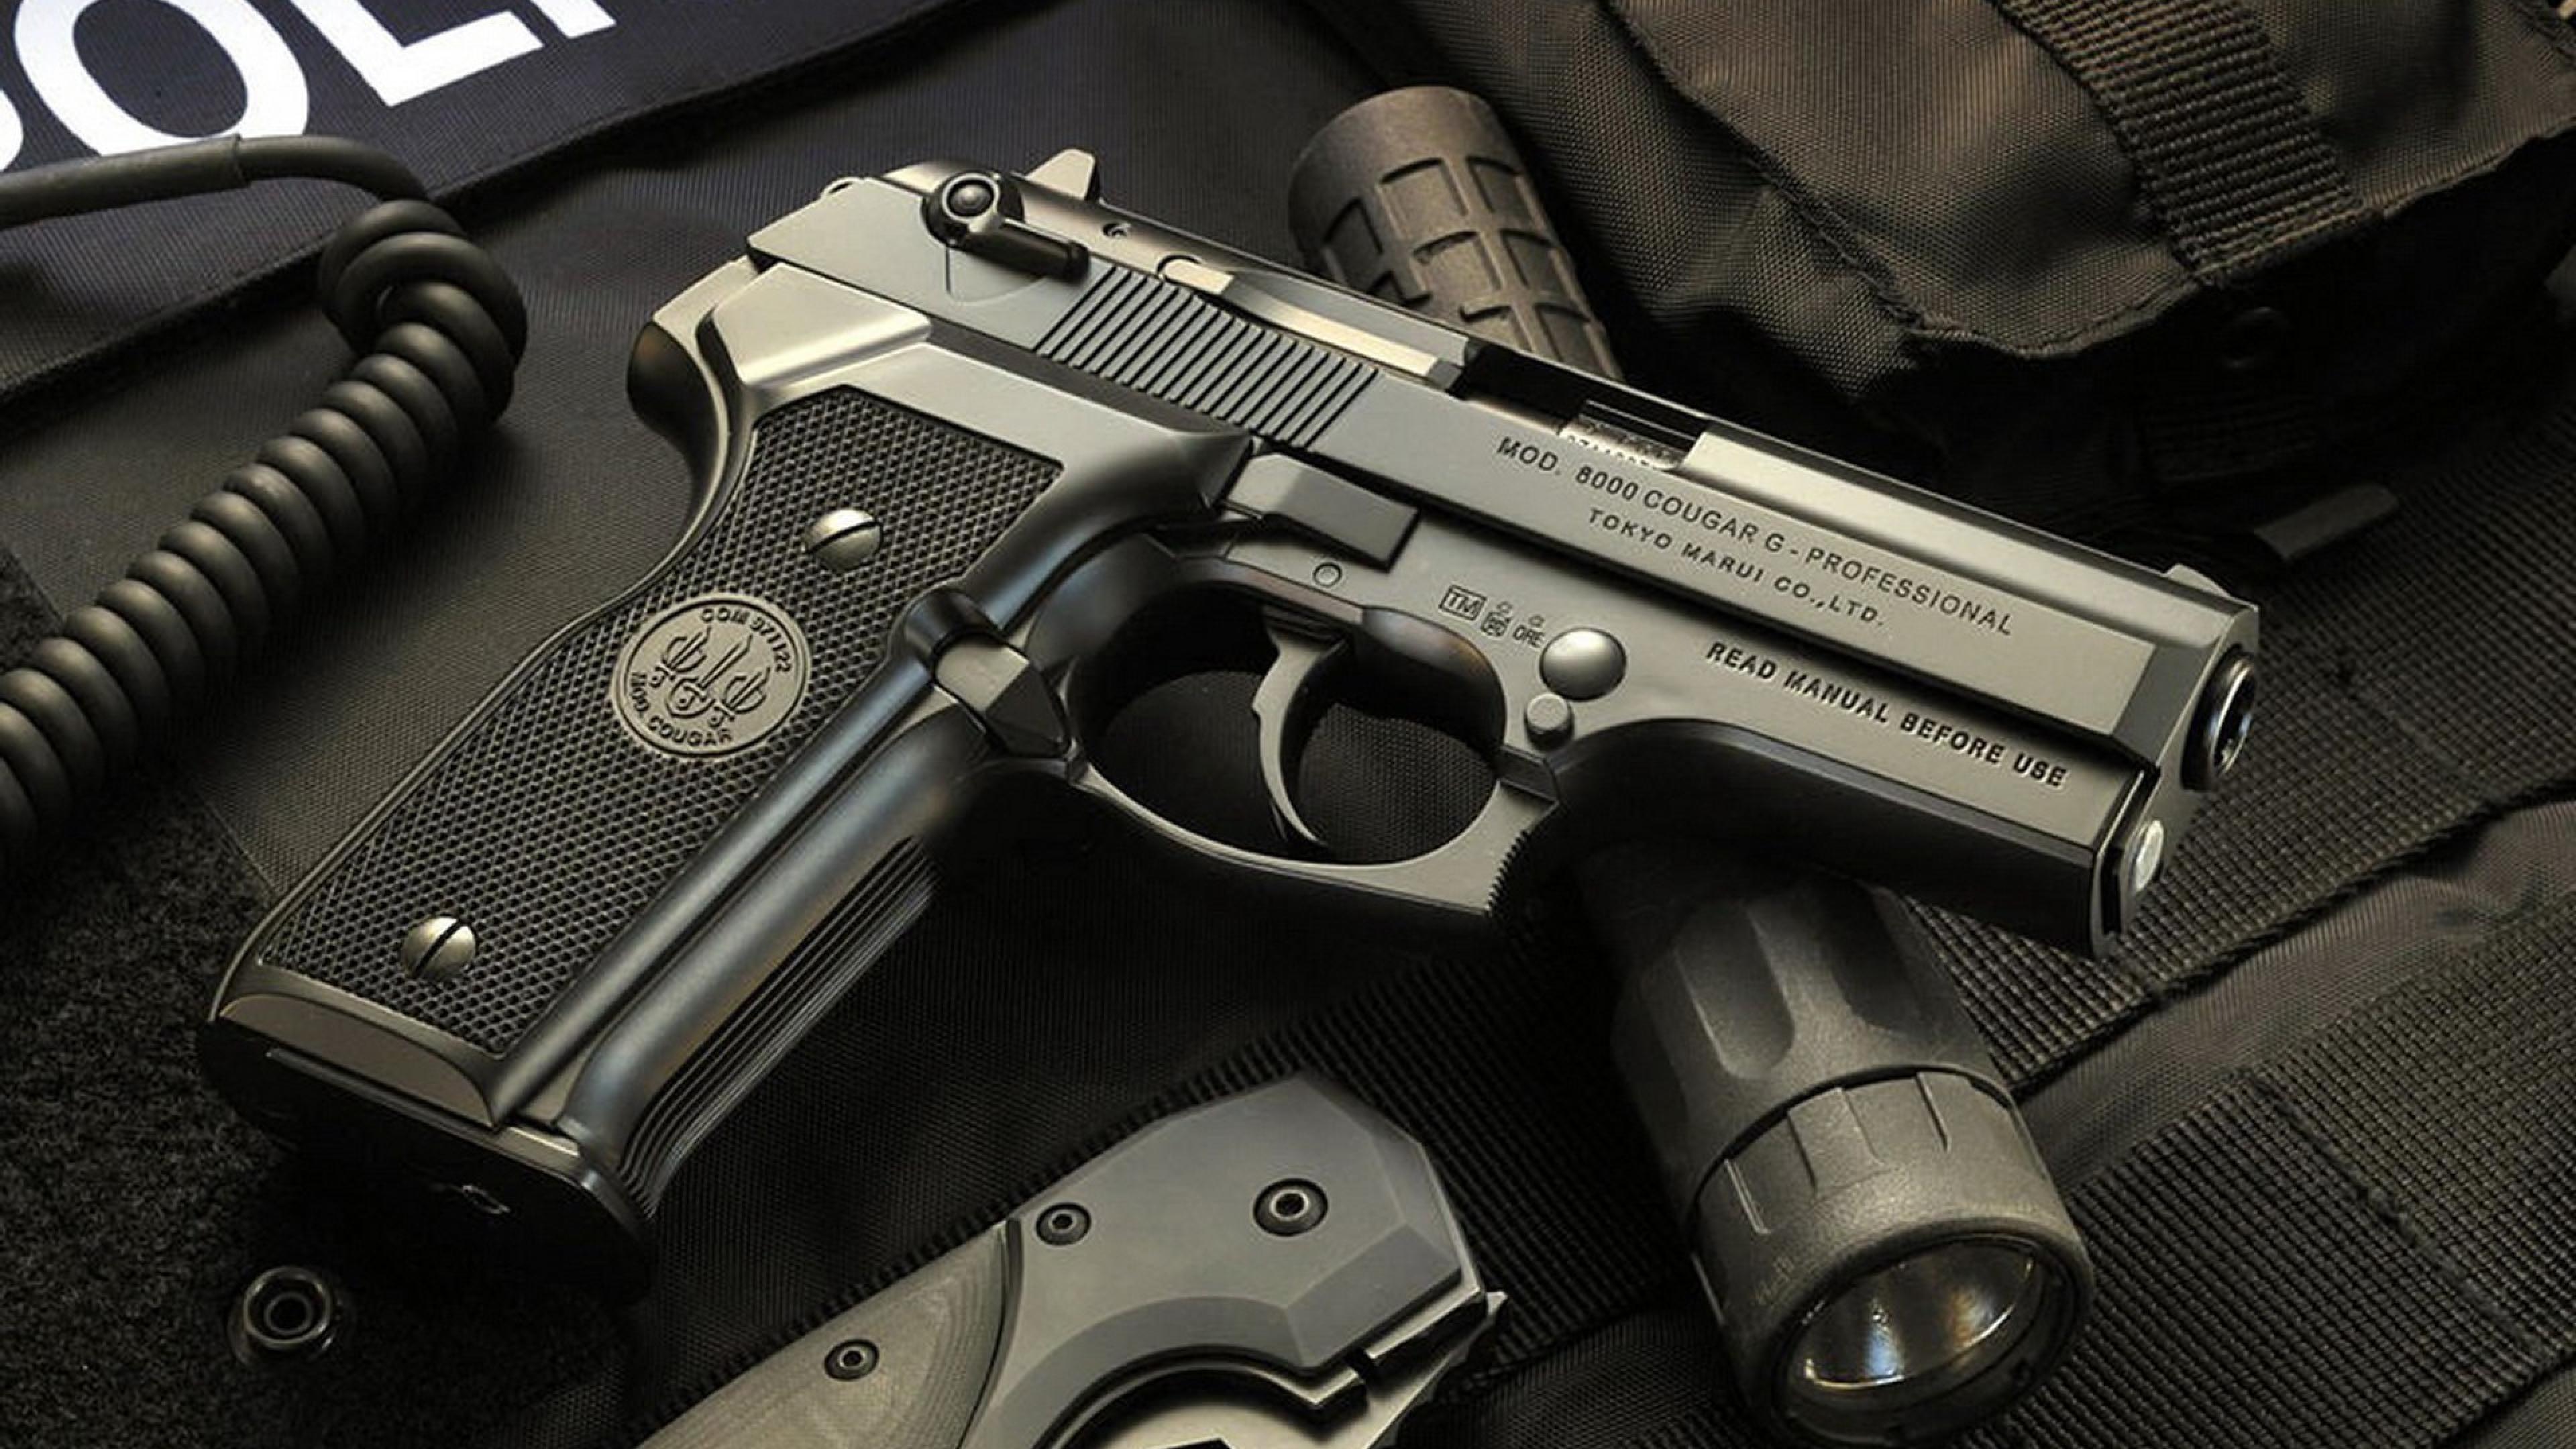 Army Arsenal guns police airsoft ultra 3840x2160 hd wallpaper 3840x2160